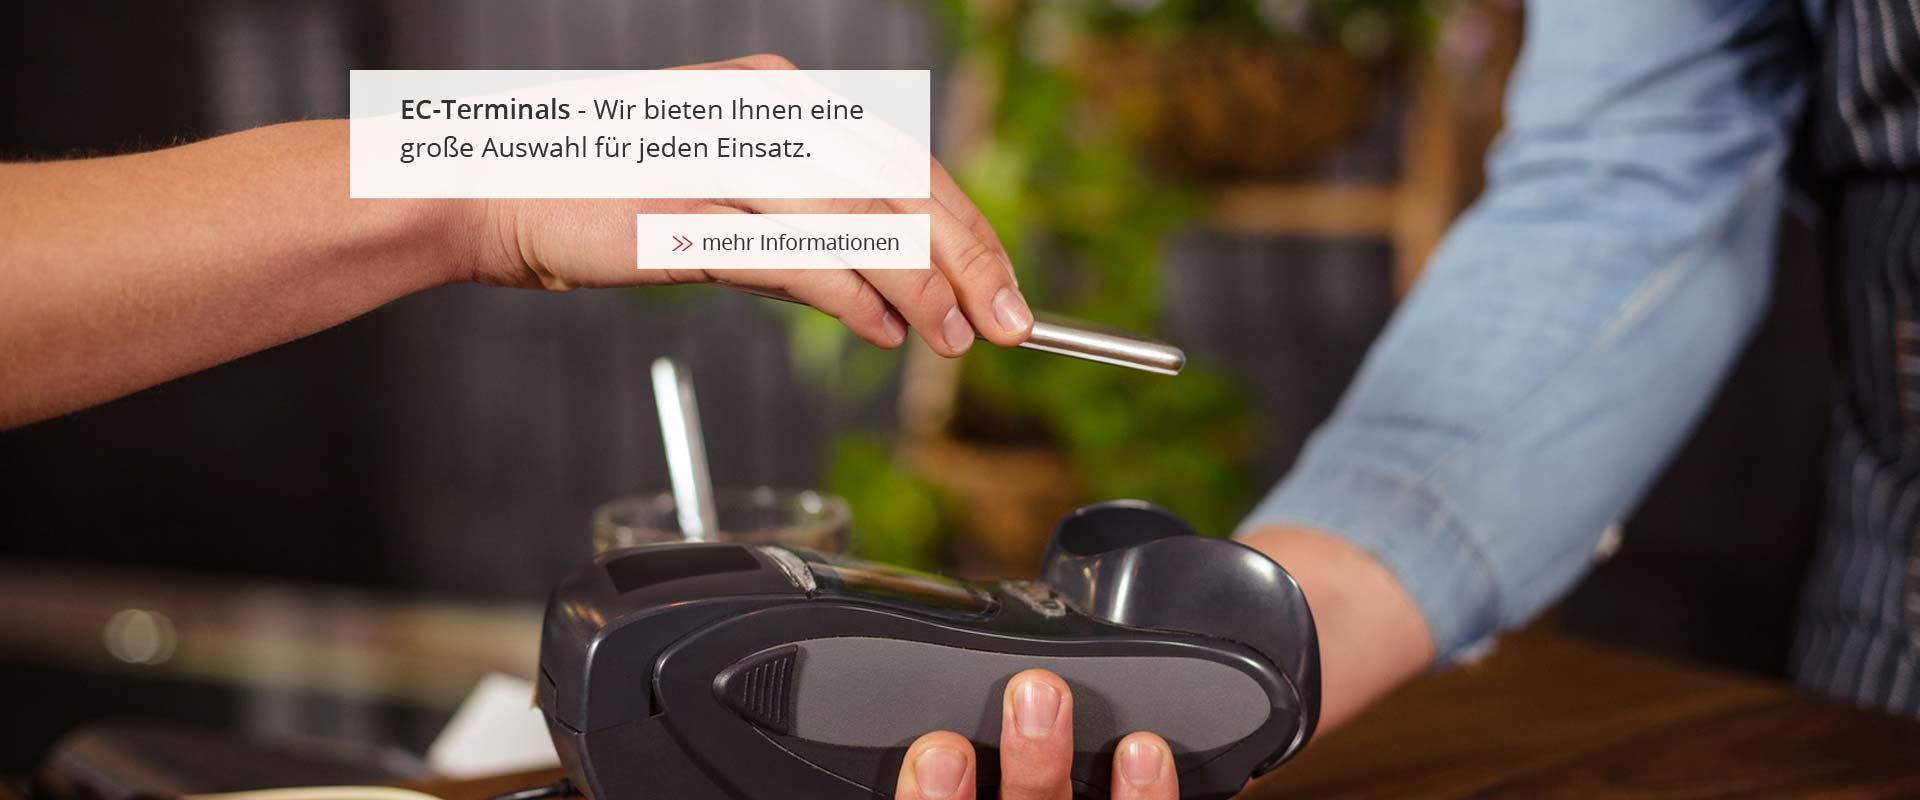 guenstige-ec-geraete-jatel24